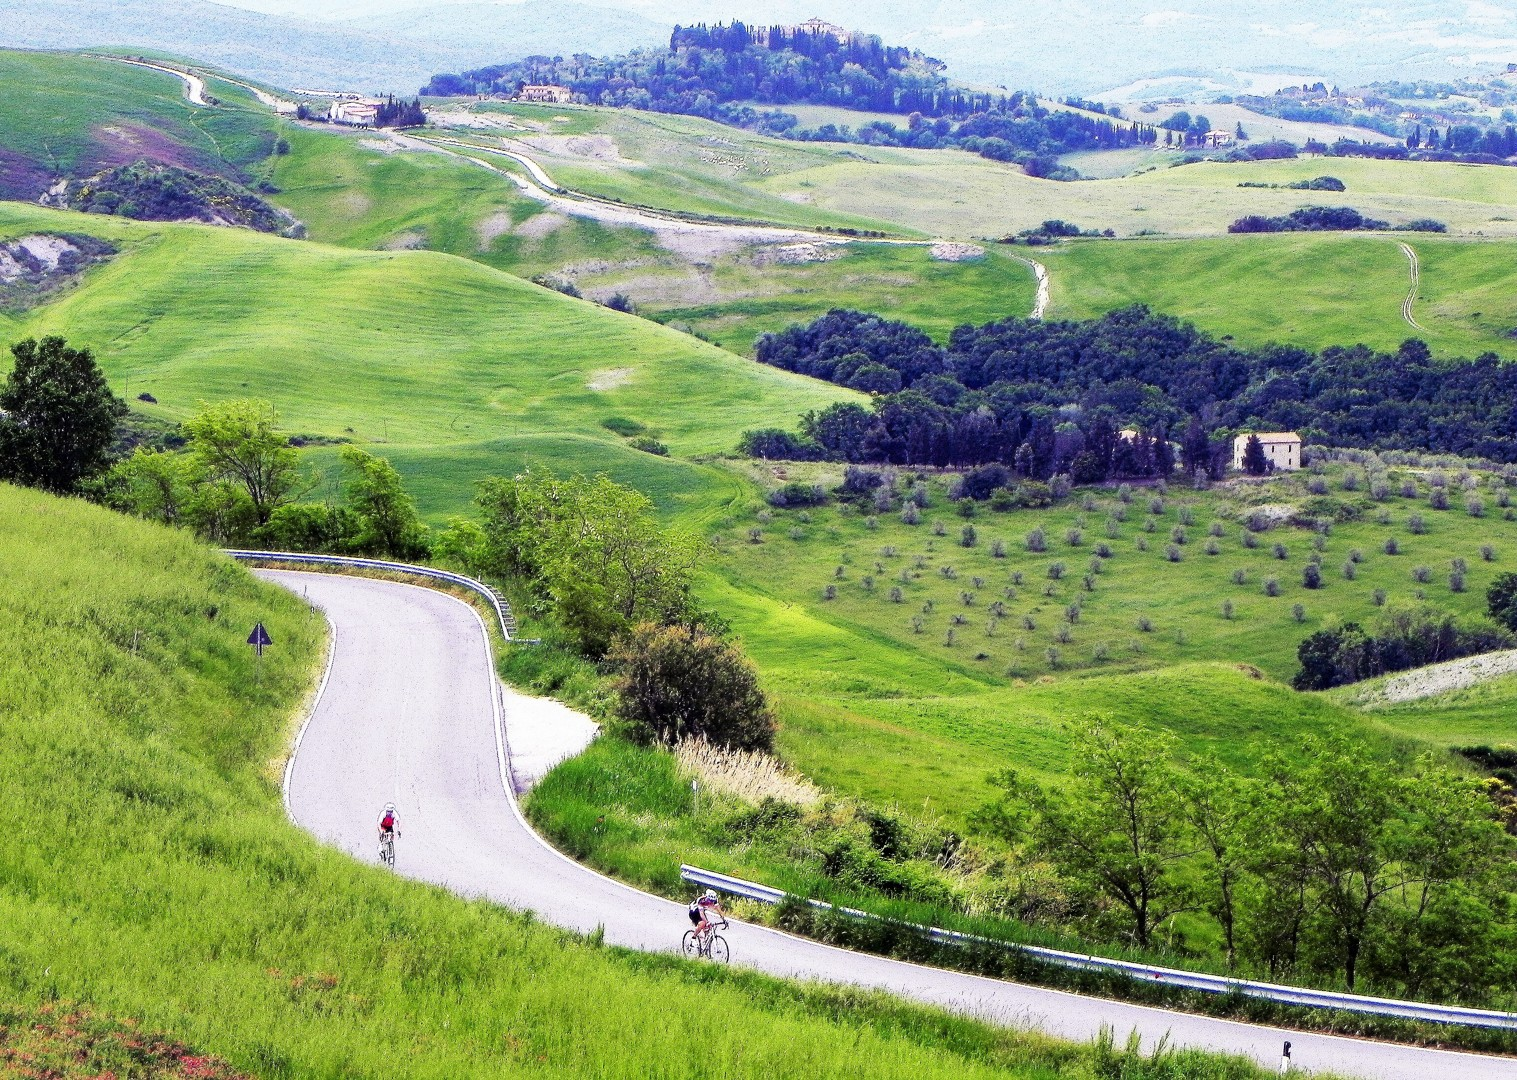 self-guided-cycling-holiday-italy-tuscany.jpg - Italy - Tuscany Tourer - Self Guided Road Cycling Holiday - Road Cycling